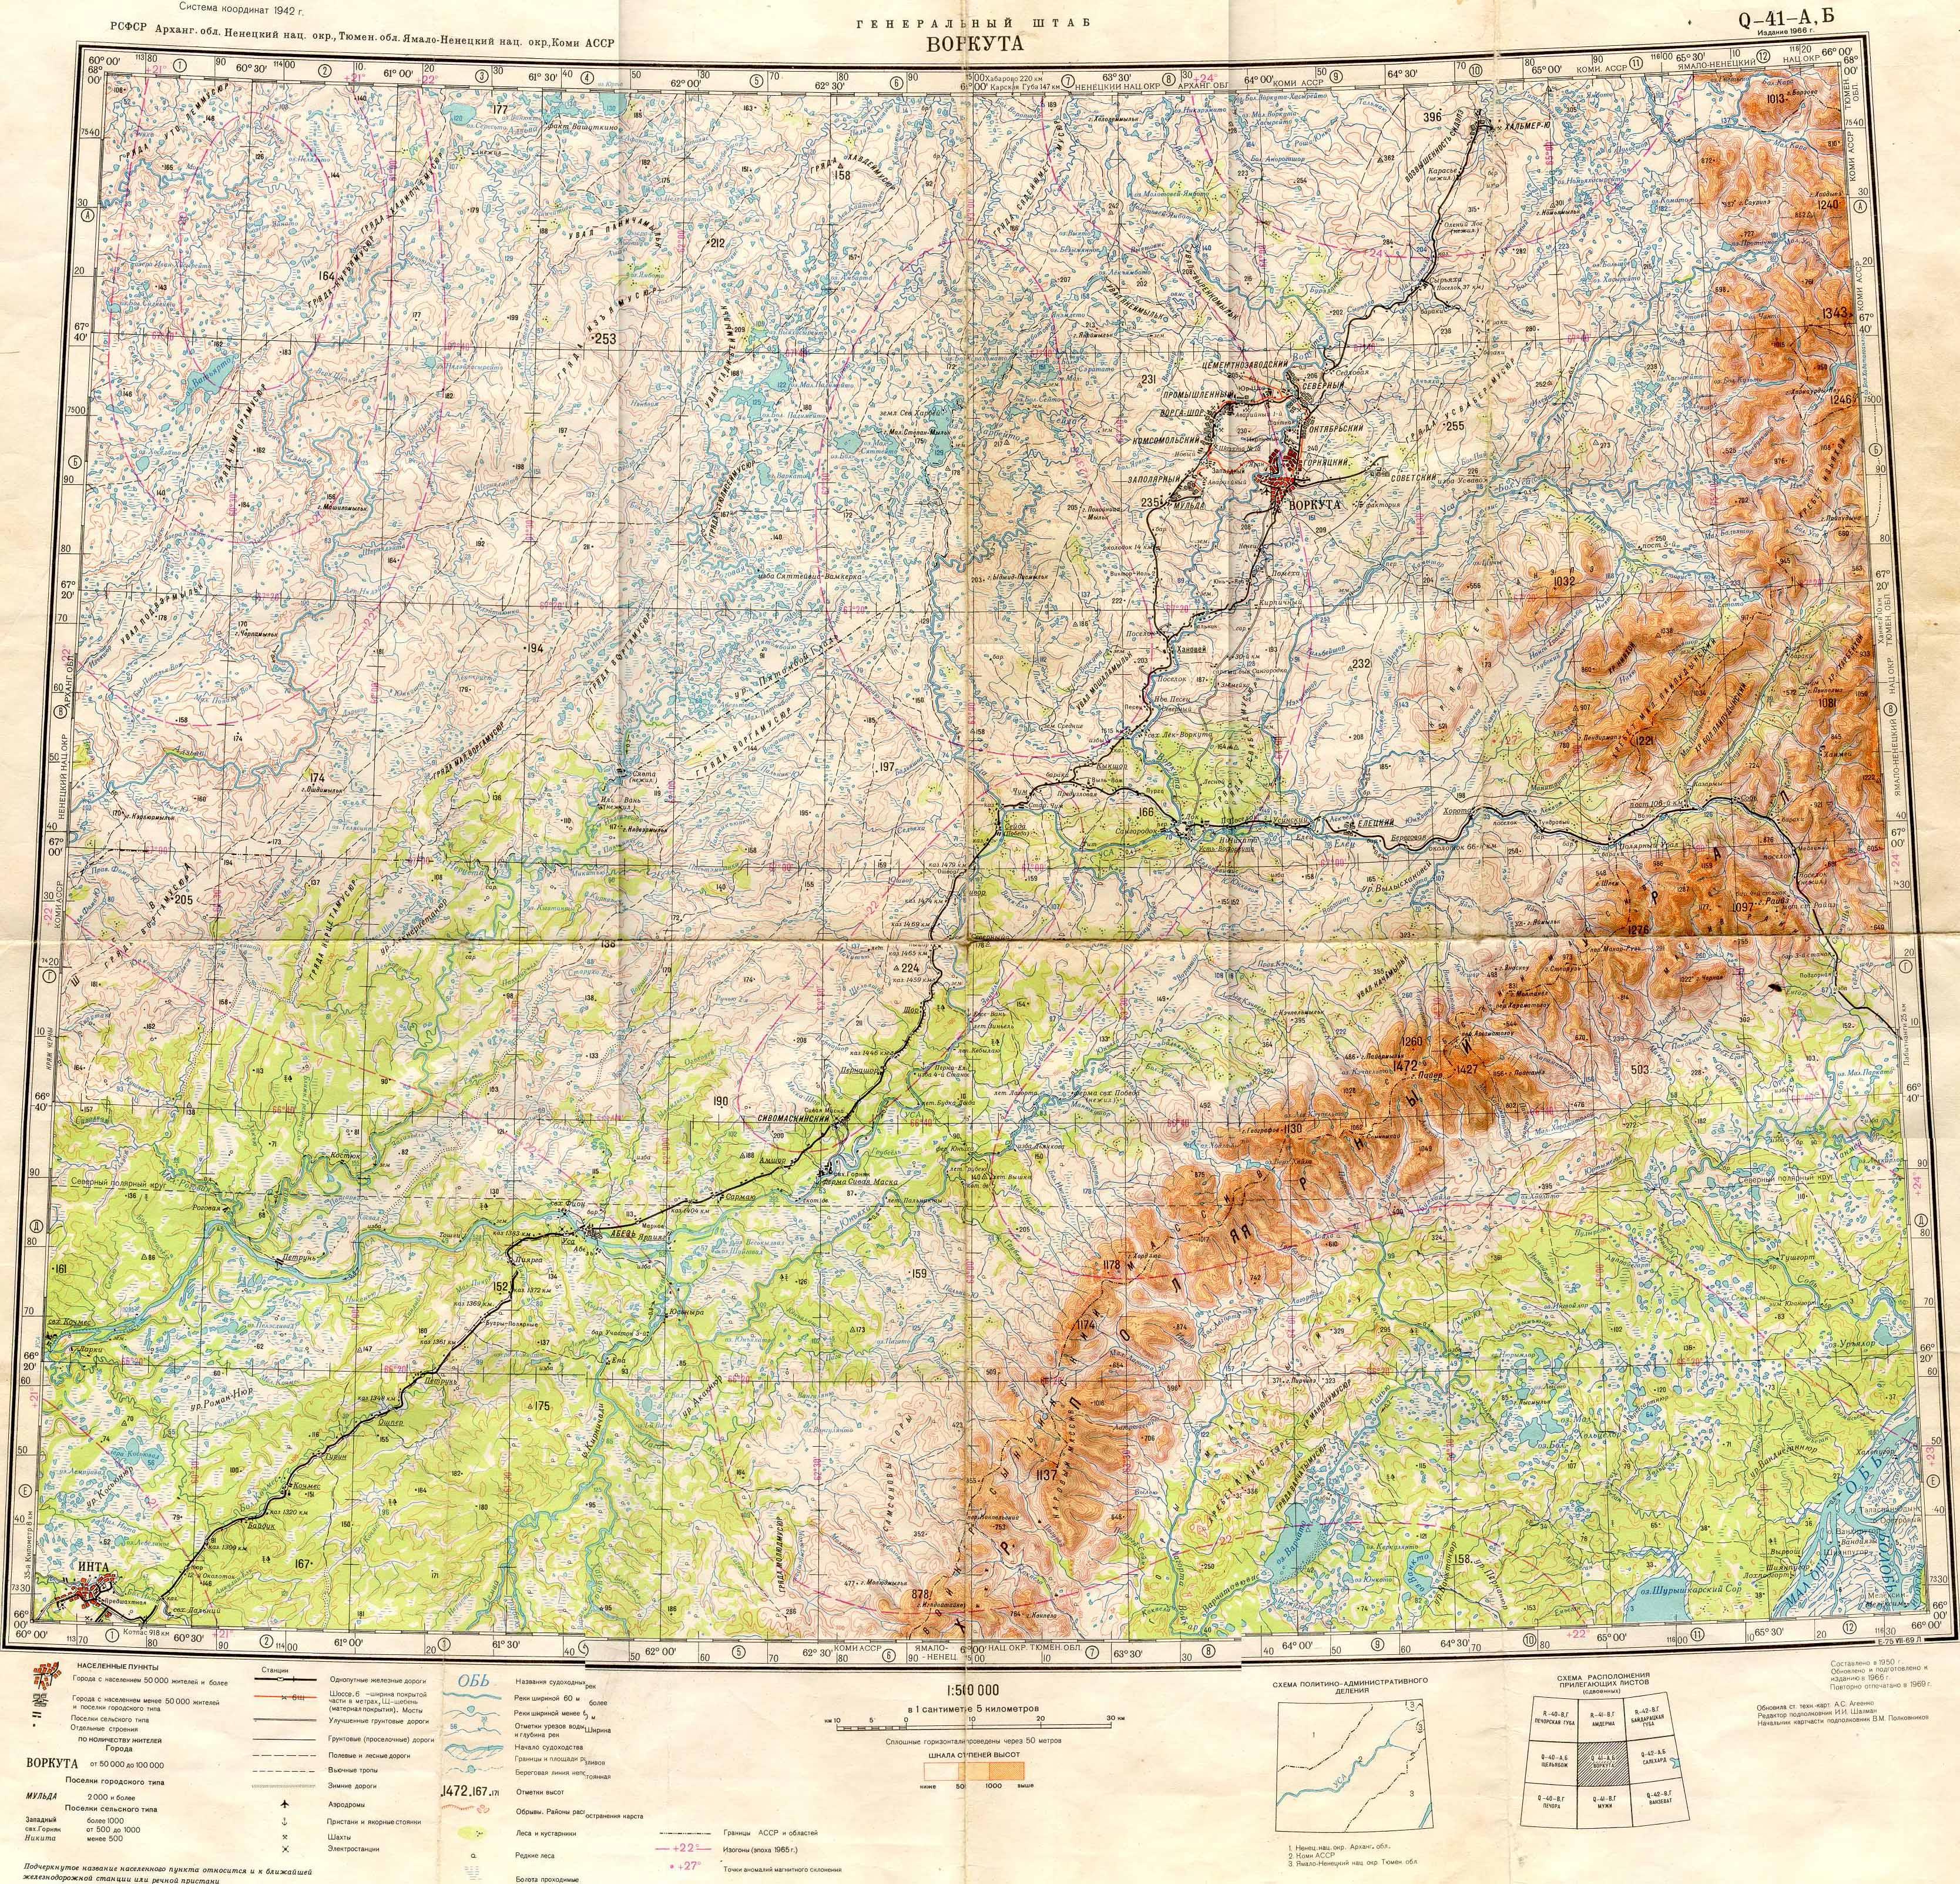 Топографическая карта Q-41-А,Б. Воркута: http://mapq41.narod.ru/map5/indexab.html